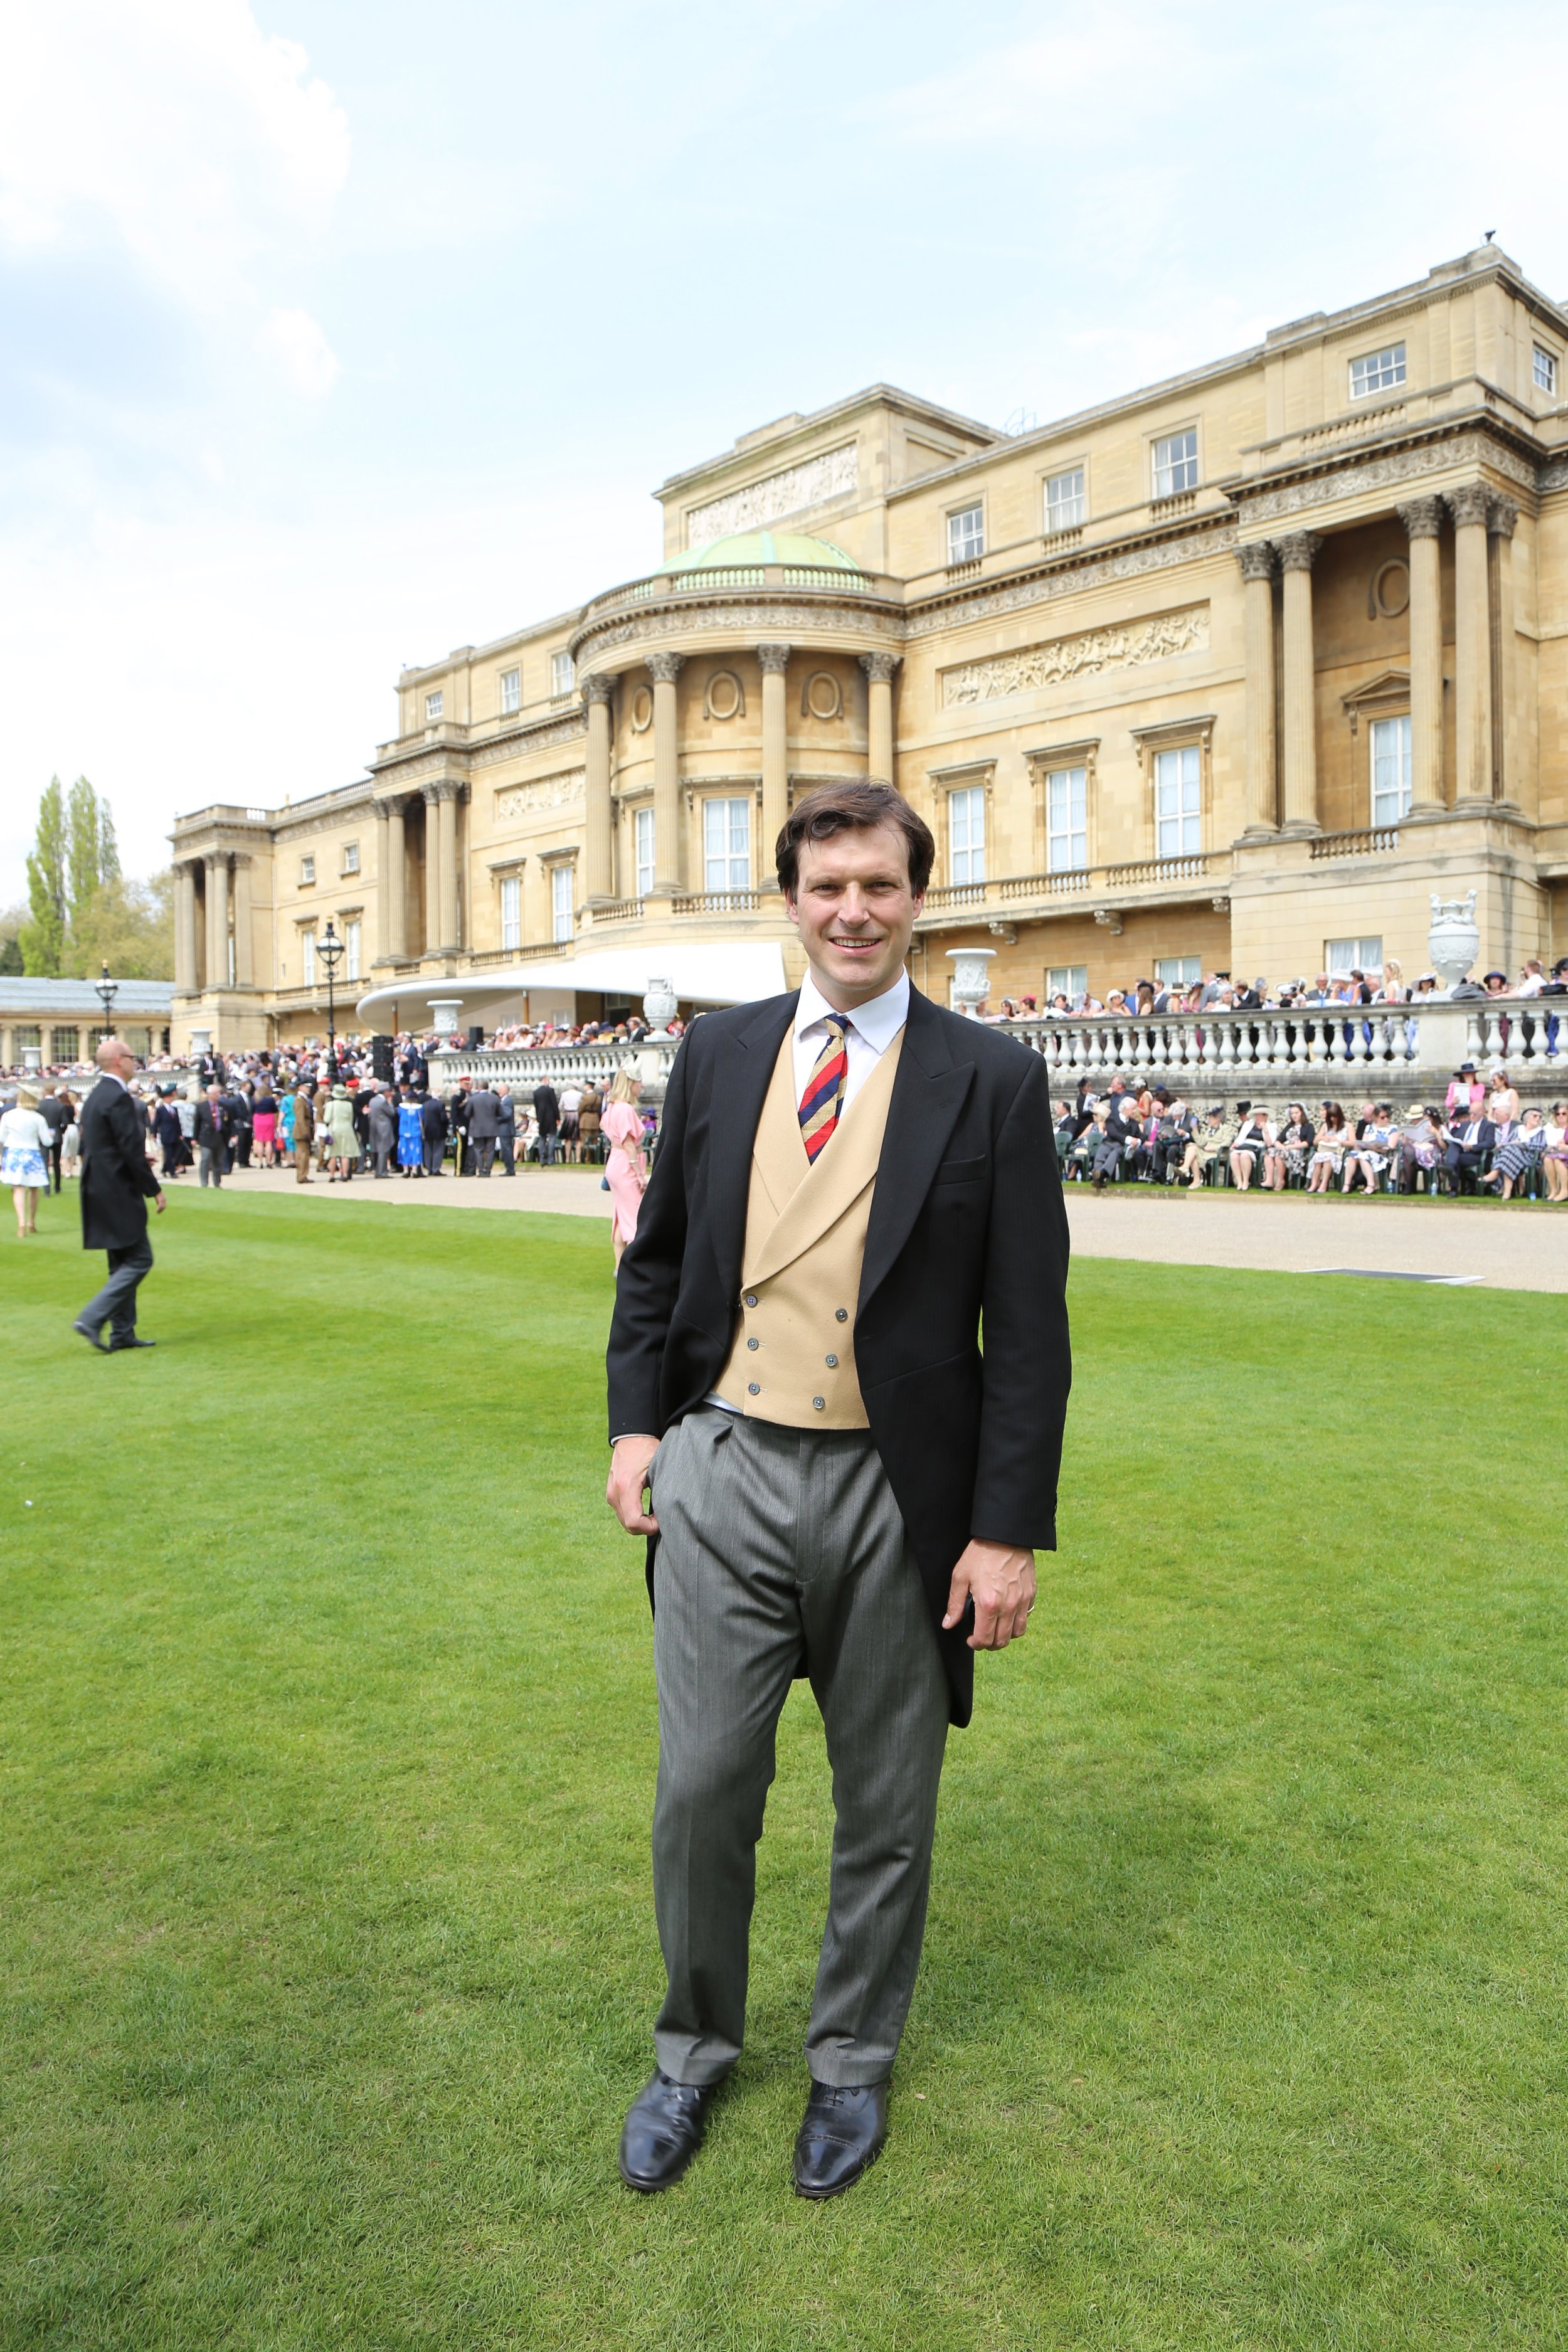 Buckingham Palace for the painting of the Royal Yoemanry Guidon Parade